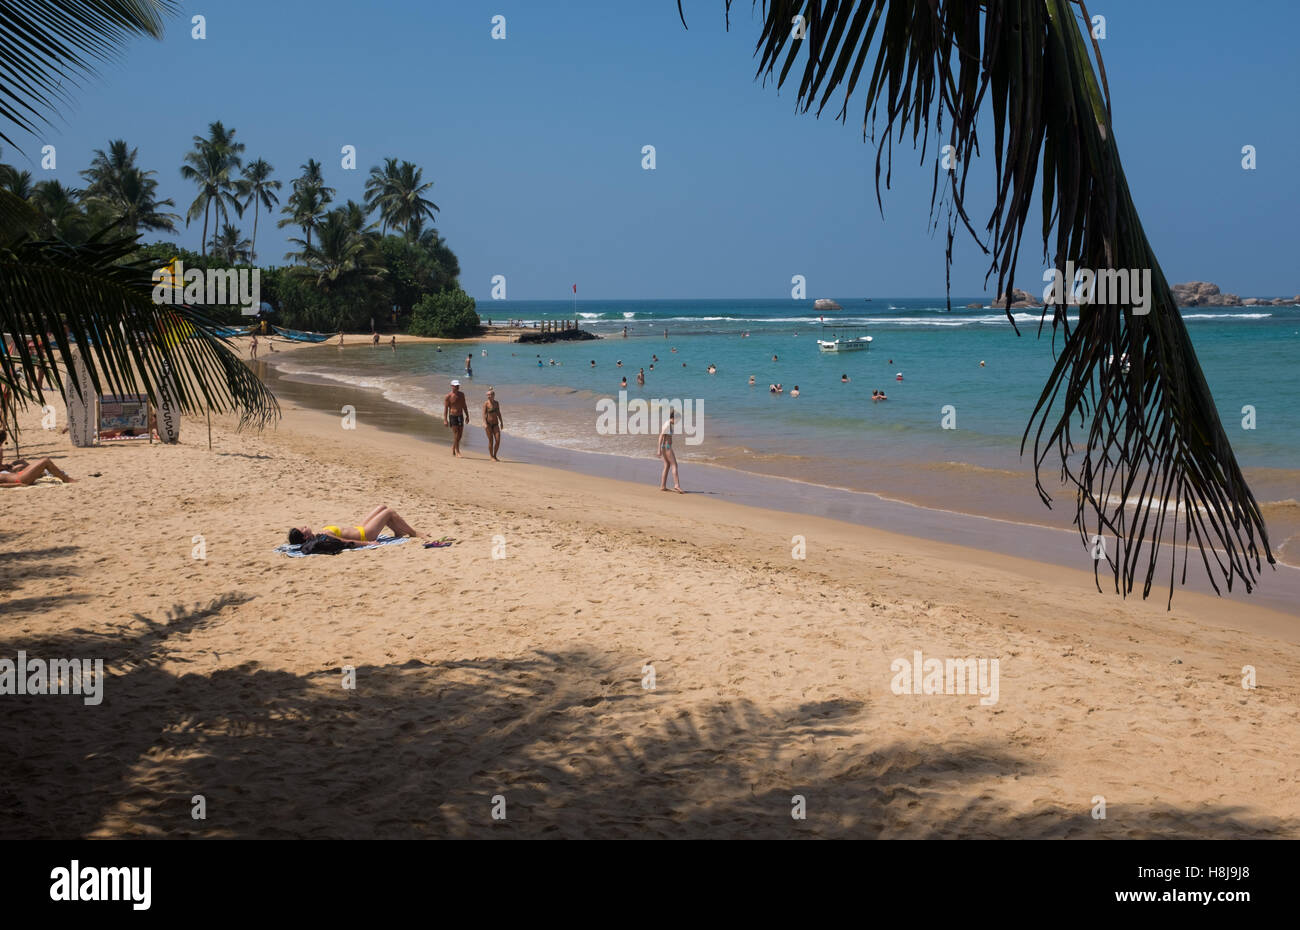 Tourists on a beach in Sri Lanka Stock Photo